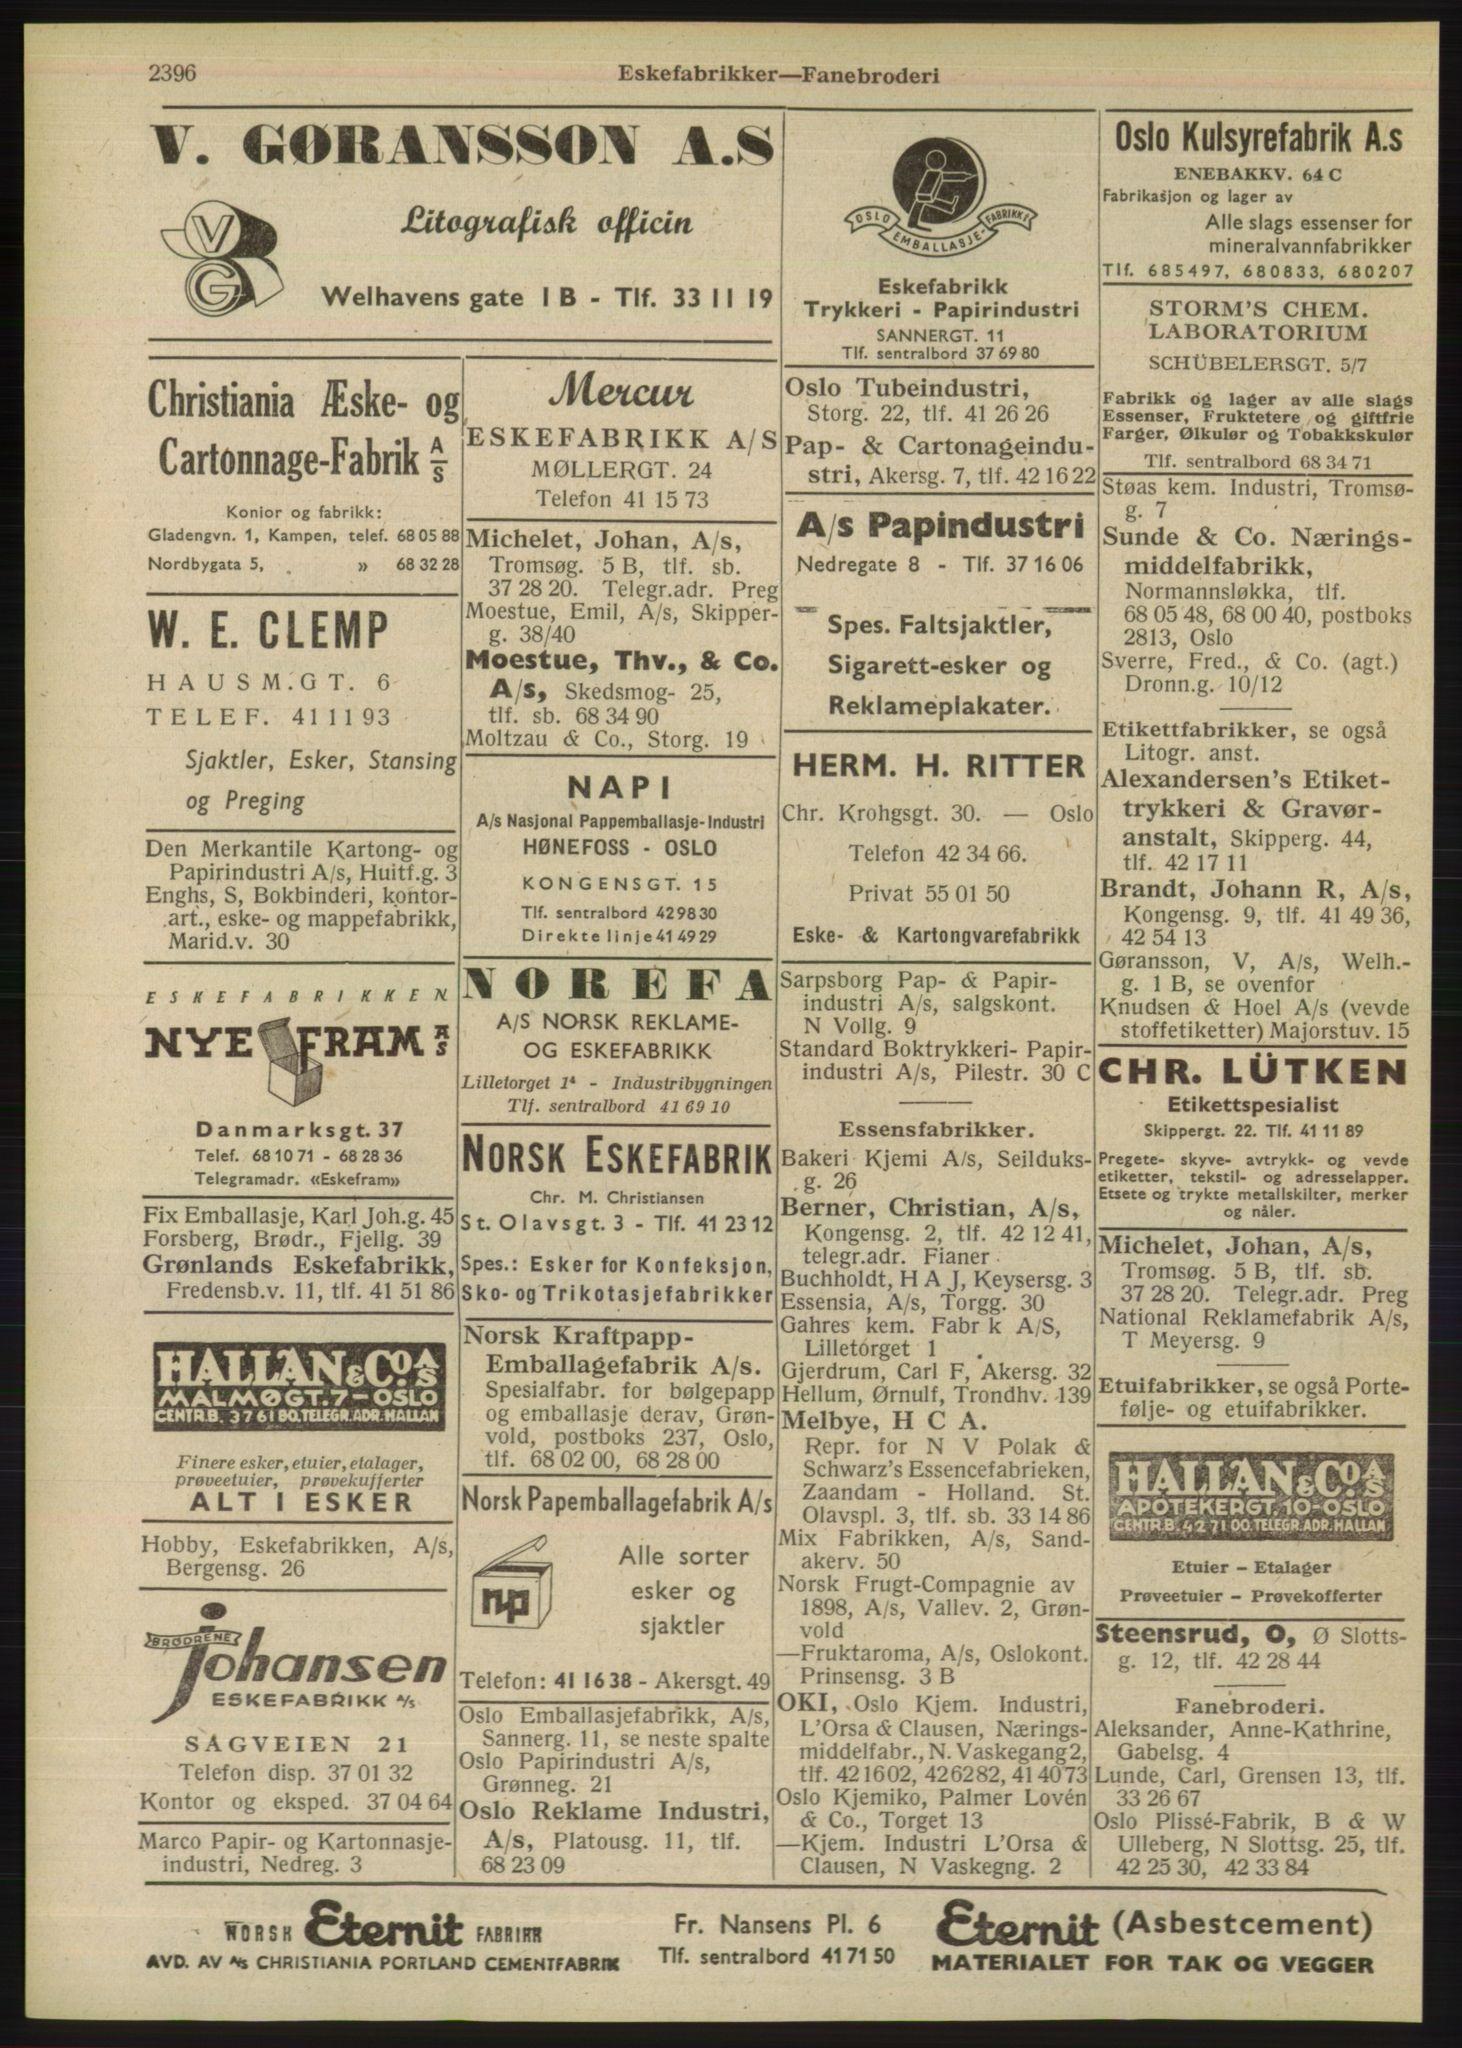 PUBL, Kristiania/Oslo adressebok, 1948, p. 2396